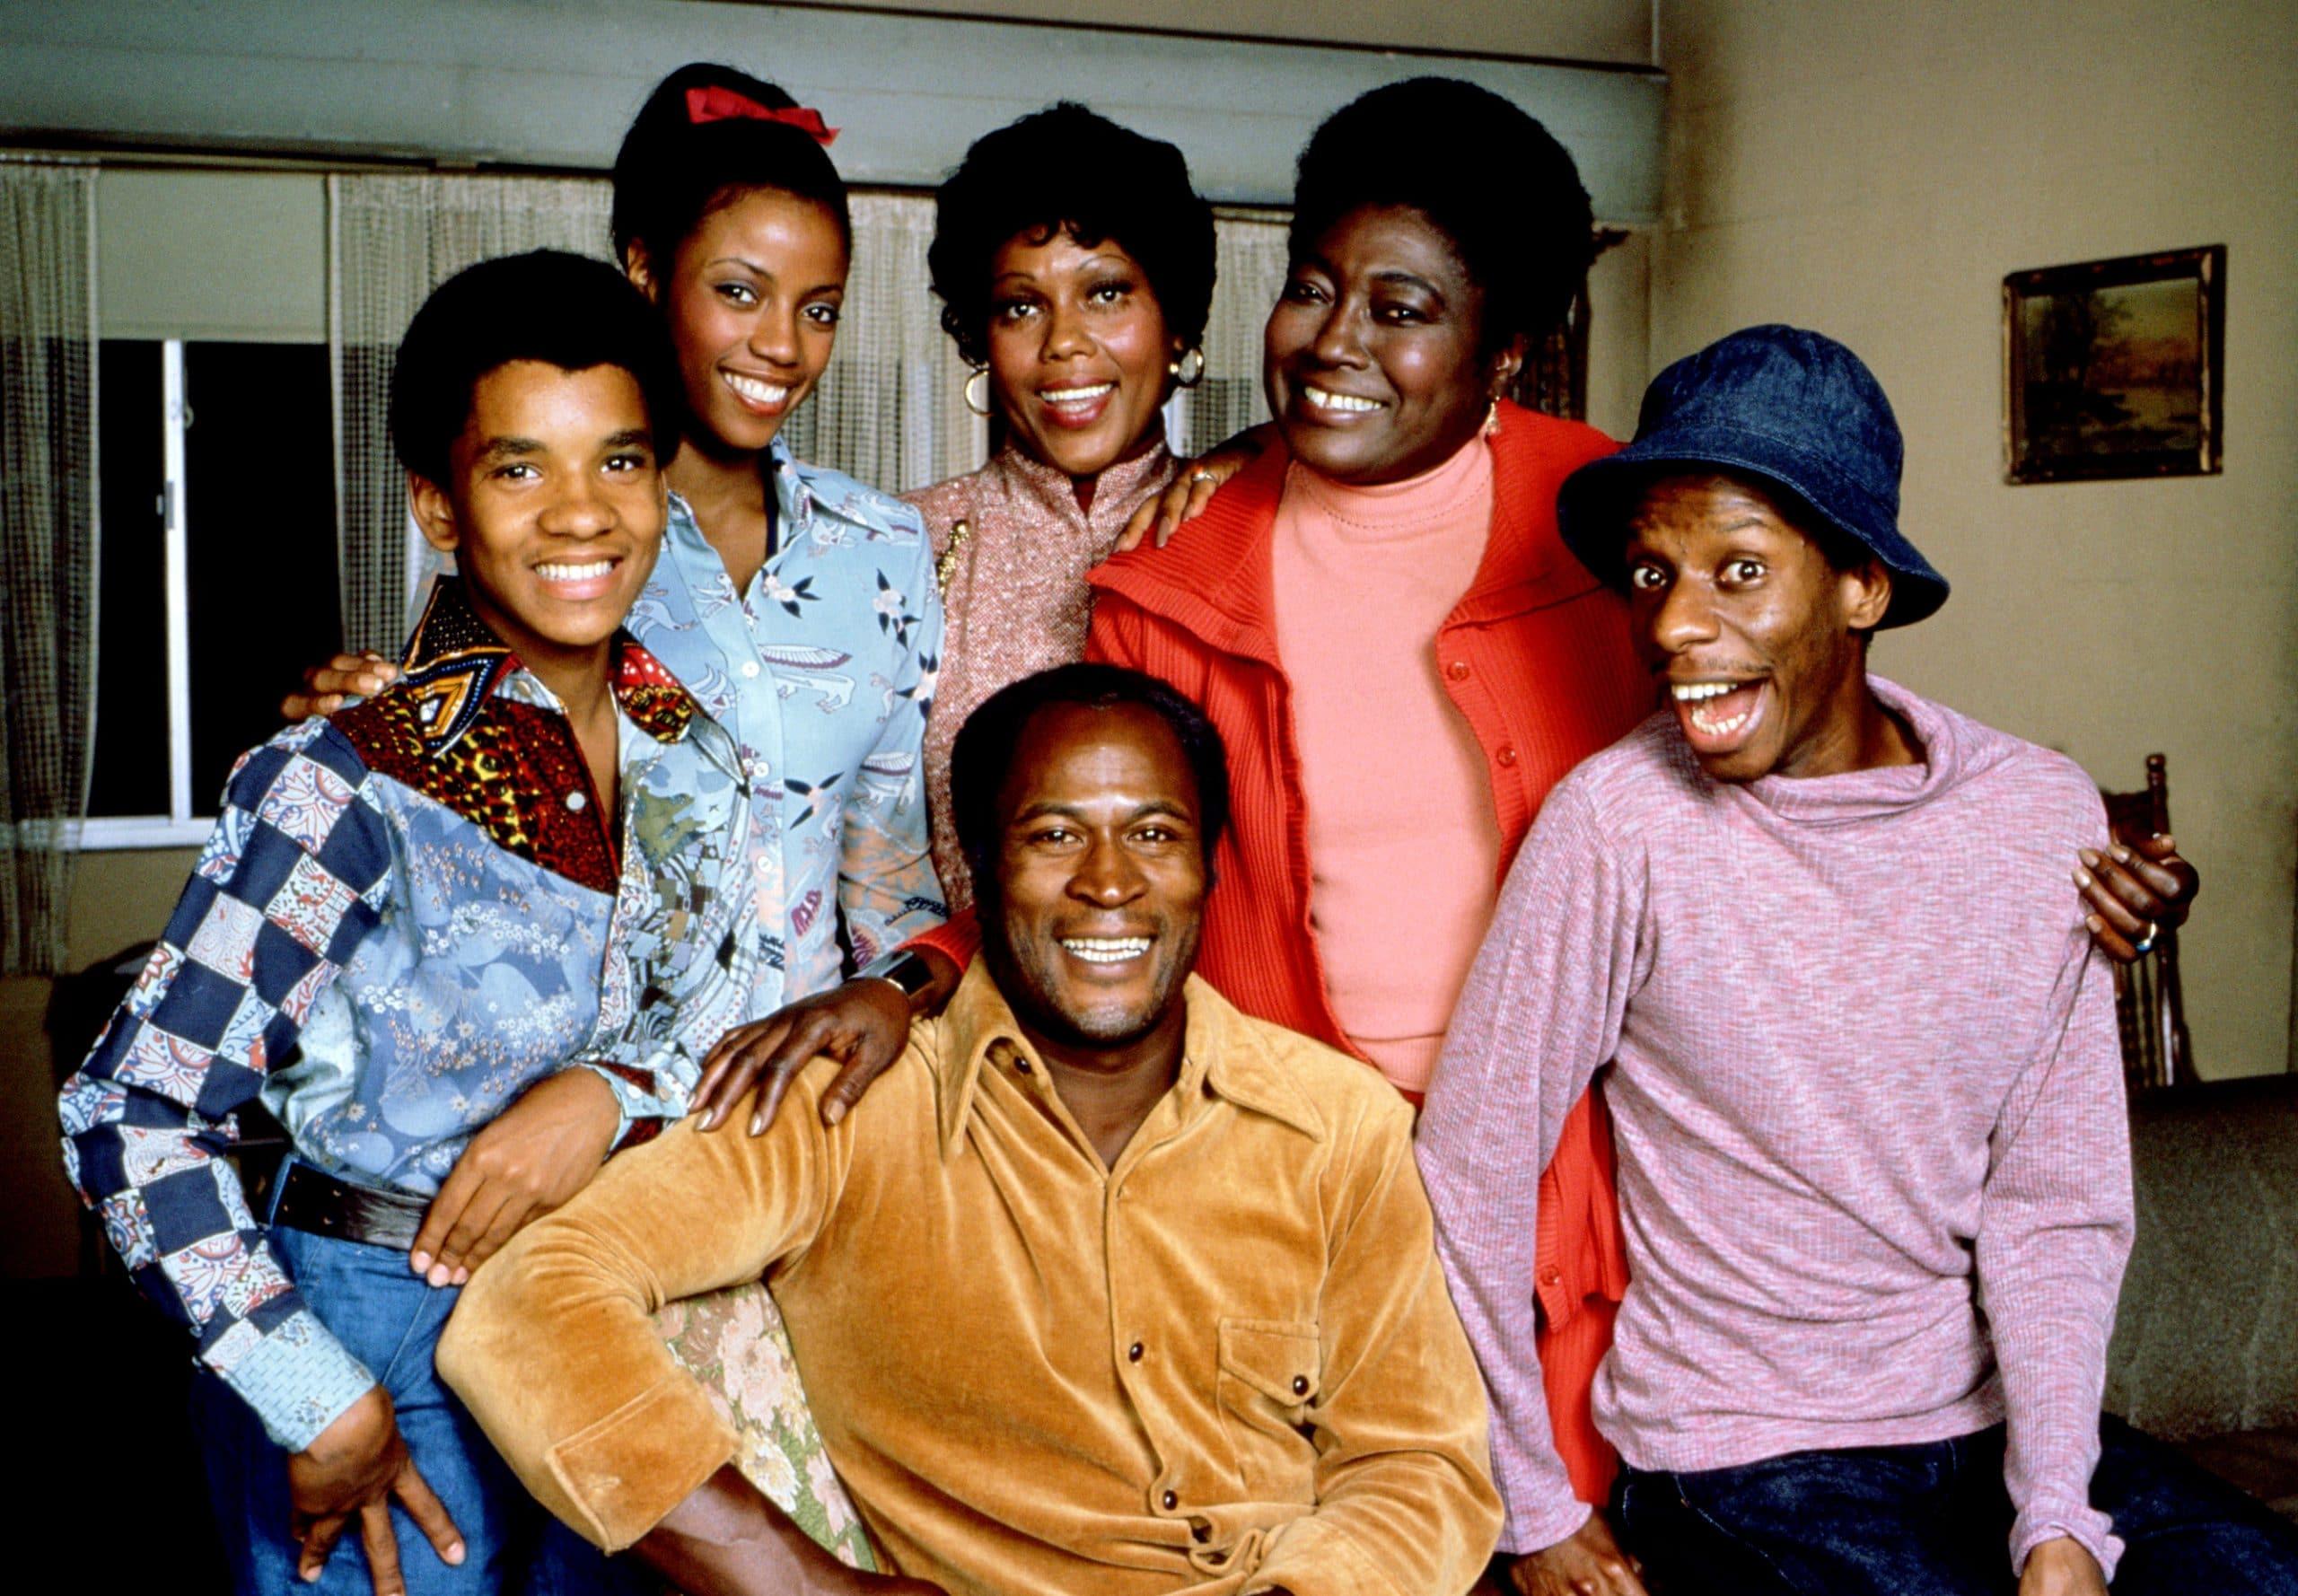 GOOD TIMES, Ralph Carter, BernNadette Stanis, Ja'net DuBois, John Amos, Esther Rolle, Jimmie Walker, 1974-1979